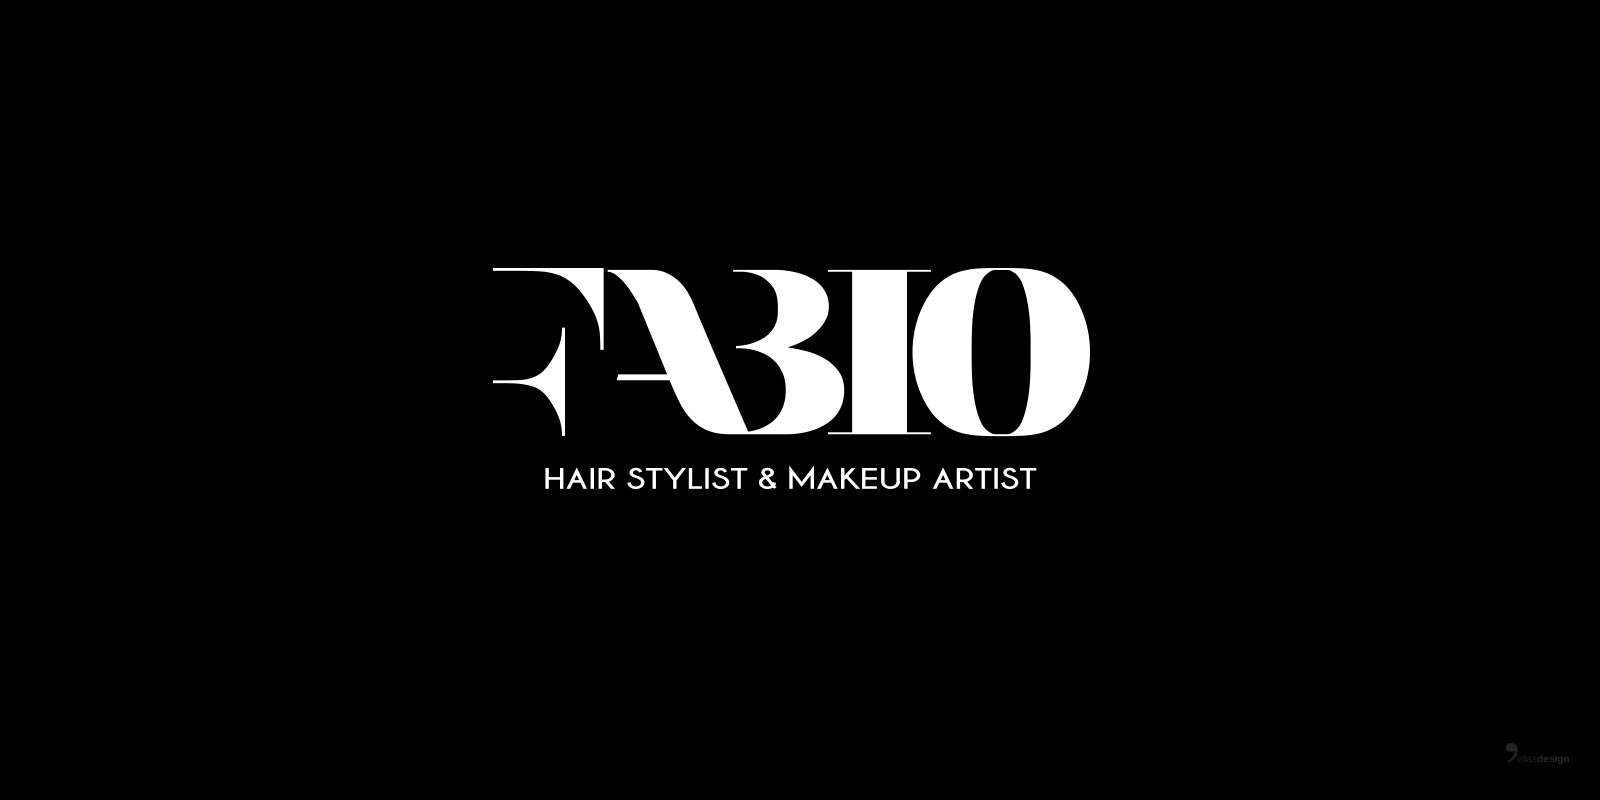 Fabio - hair stylist